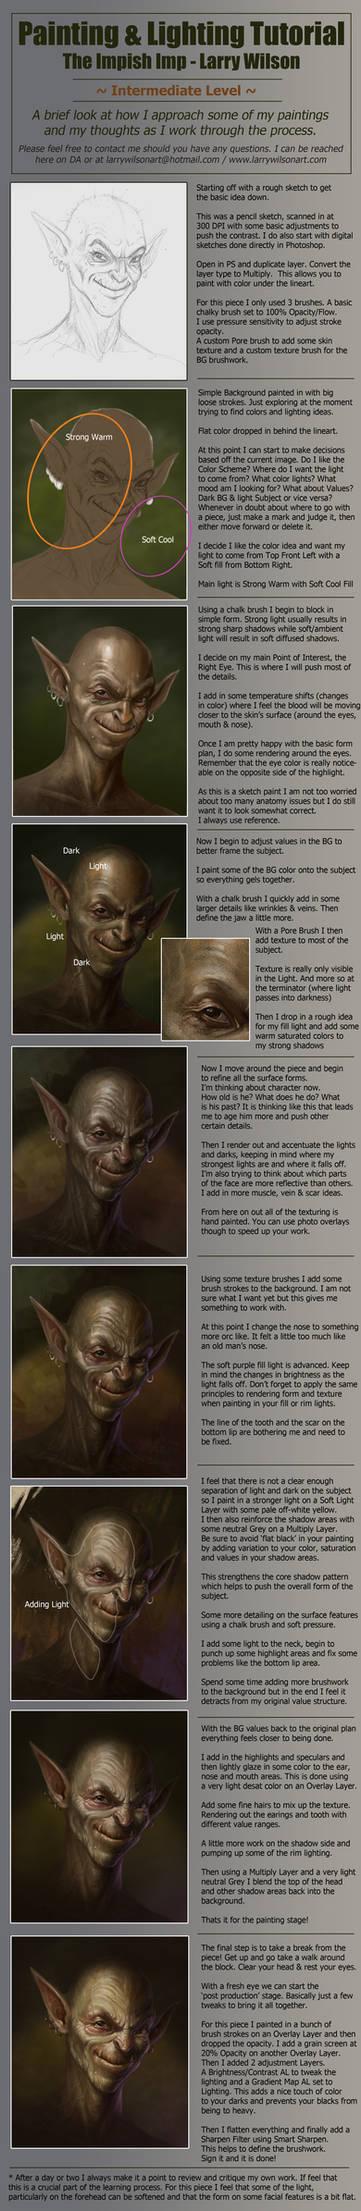 Lighting And Painting Tutorial - The Impish Imp